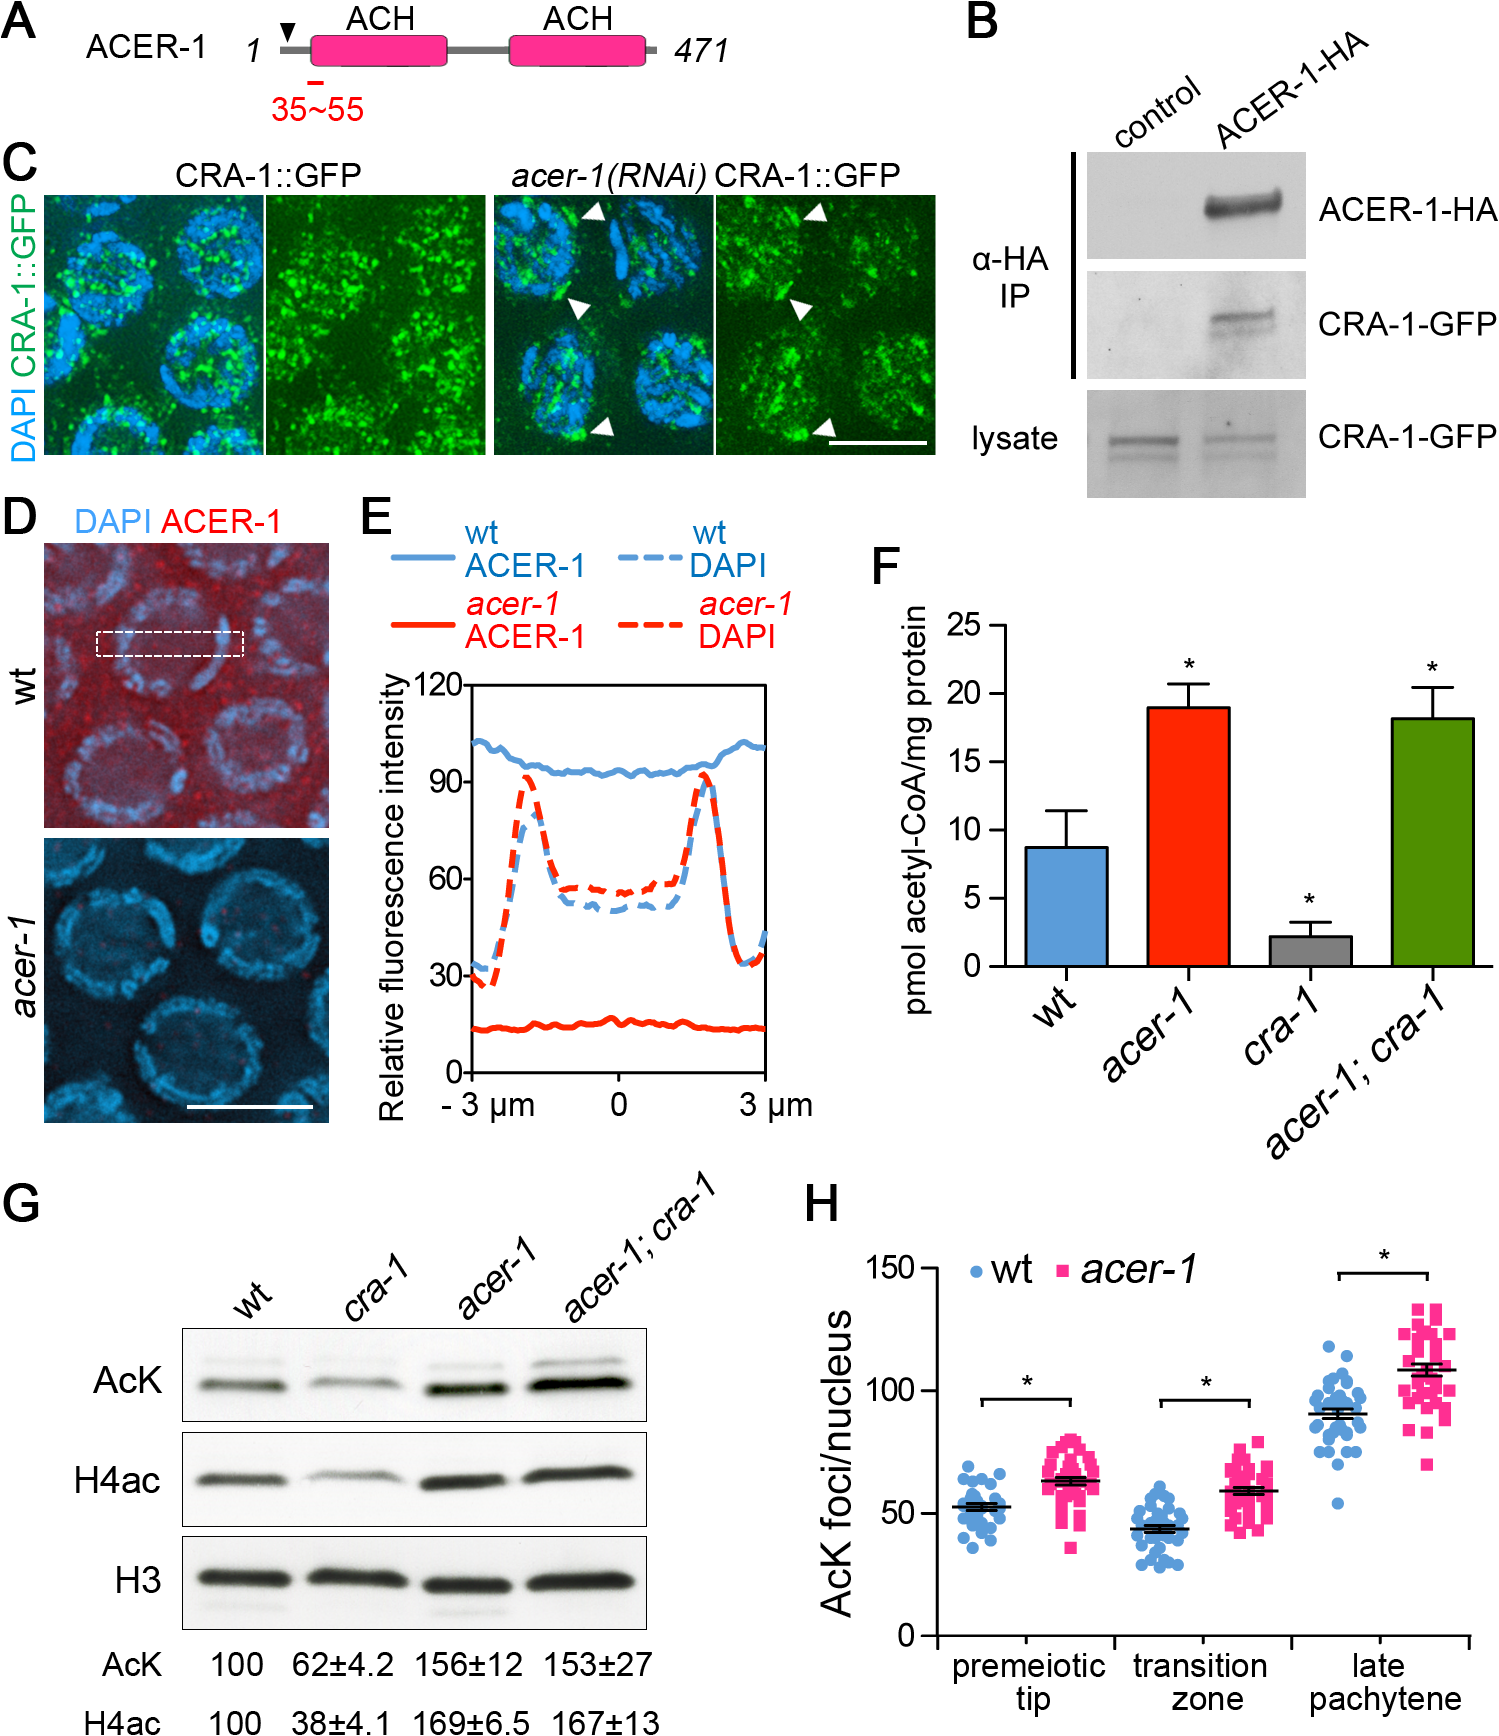 CRA-1 regulates histone acetylation by antagonizing ACER-1.